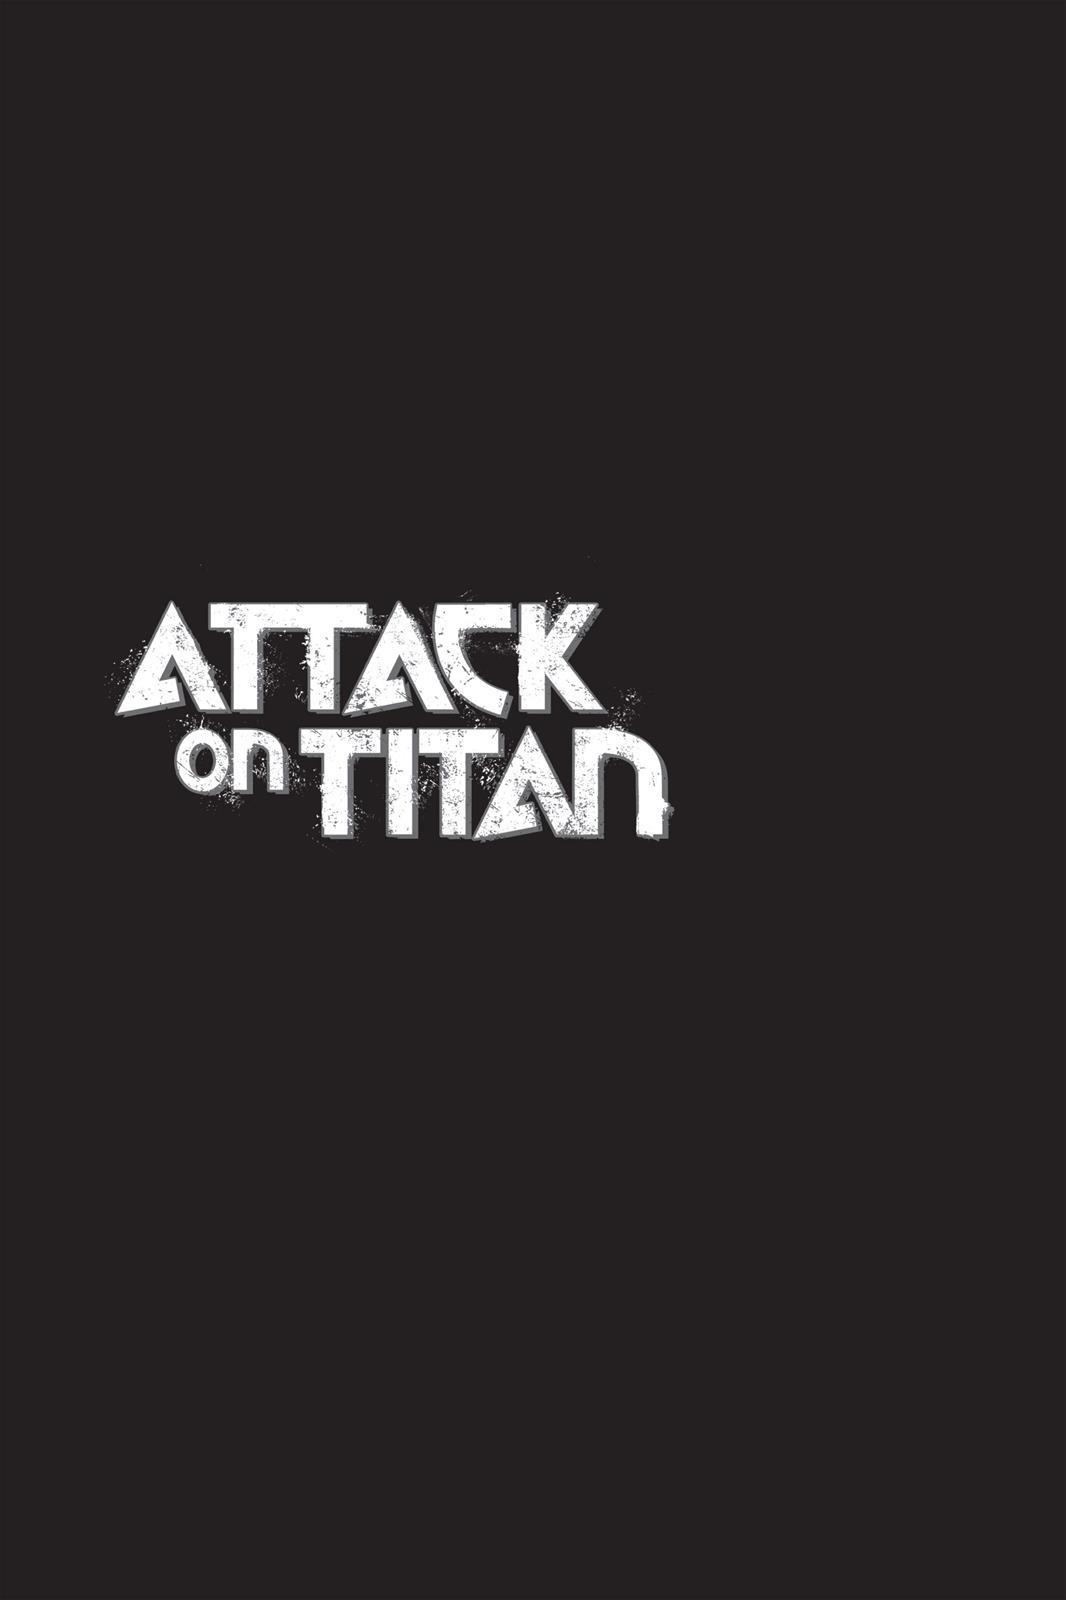 Attack On Titan, Episode 6 image 038